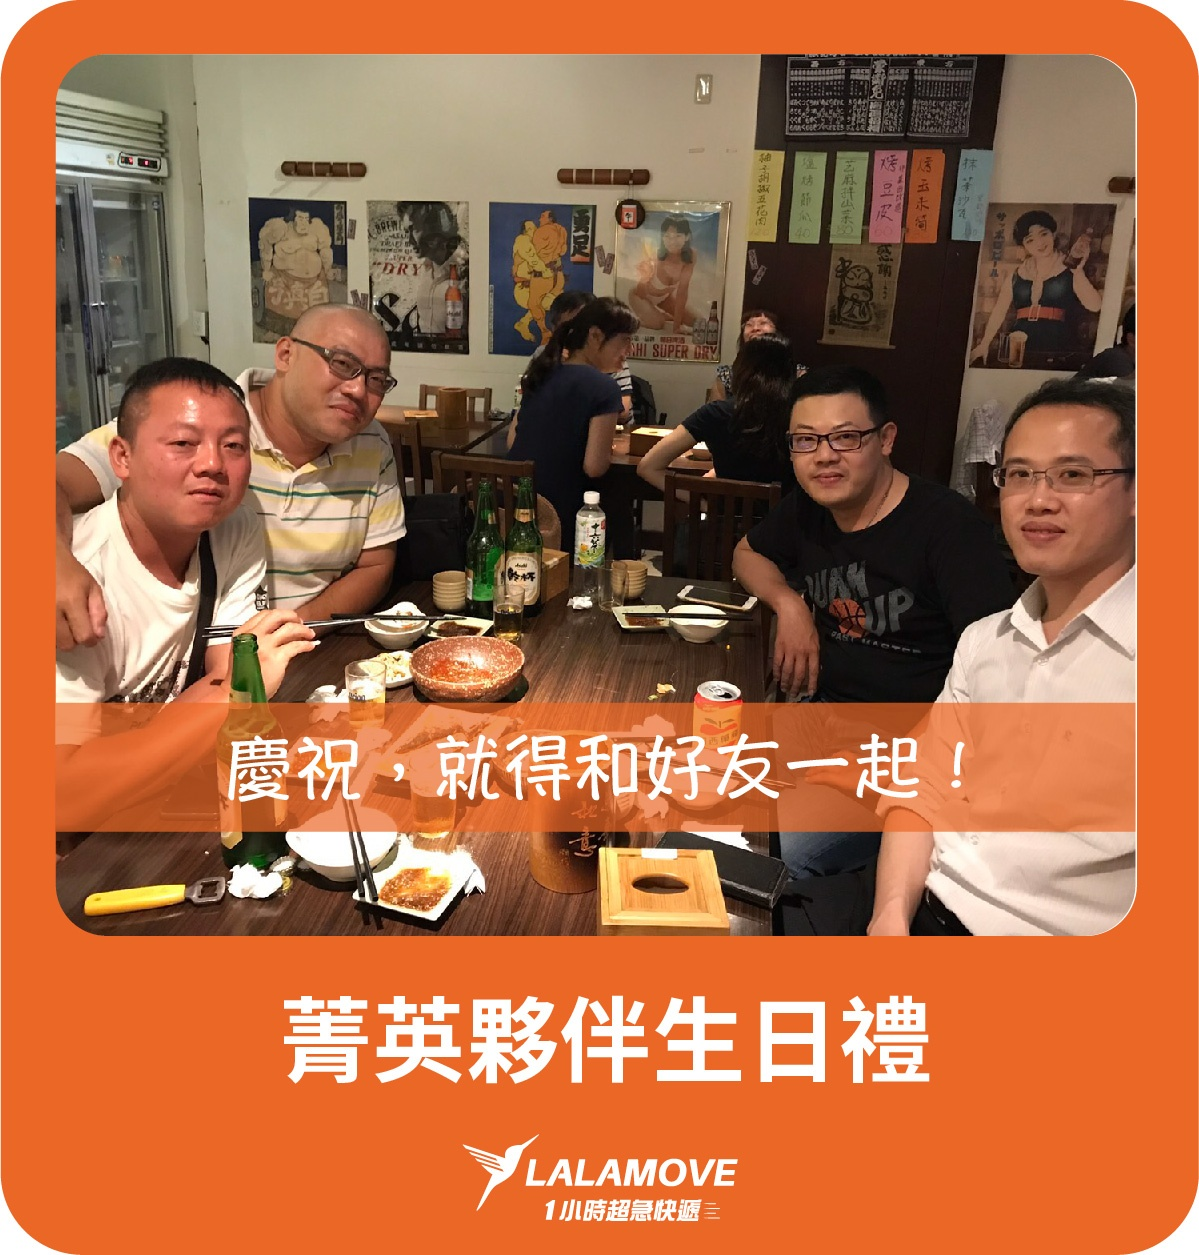 tw_20171210_blog_driver_zh_stardrivergift-01.jpg